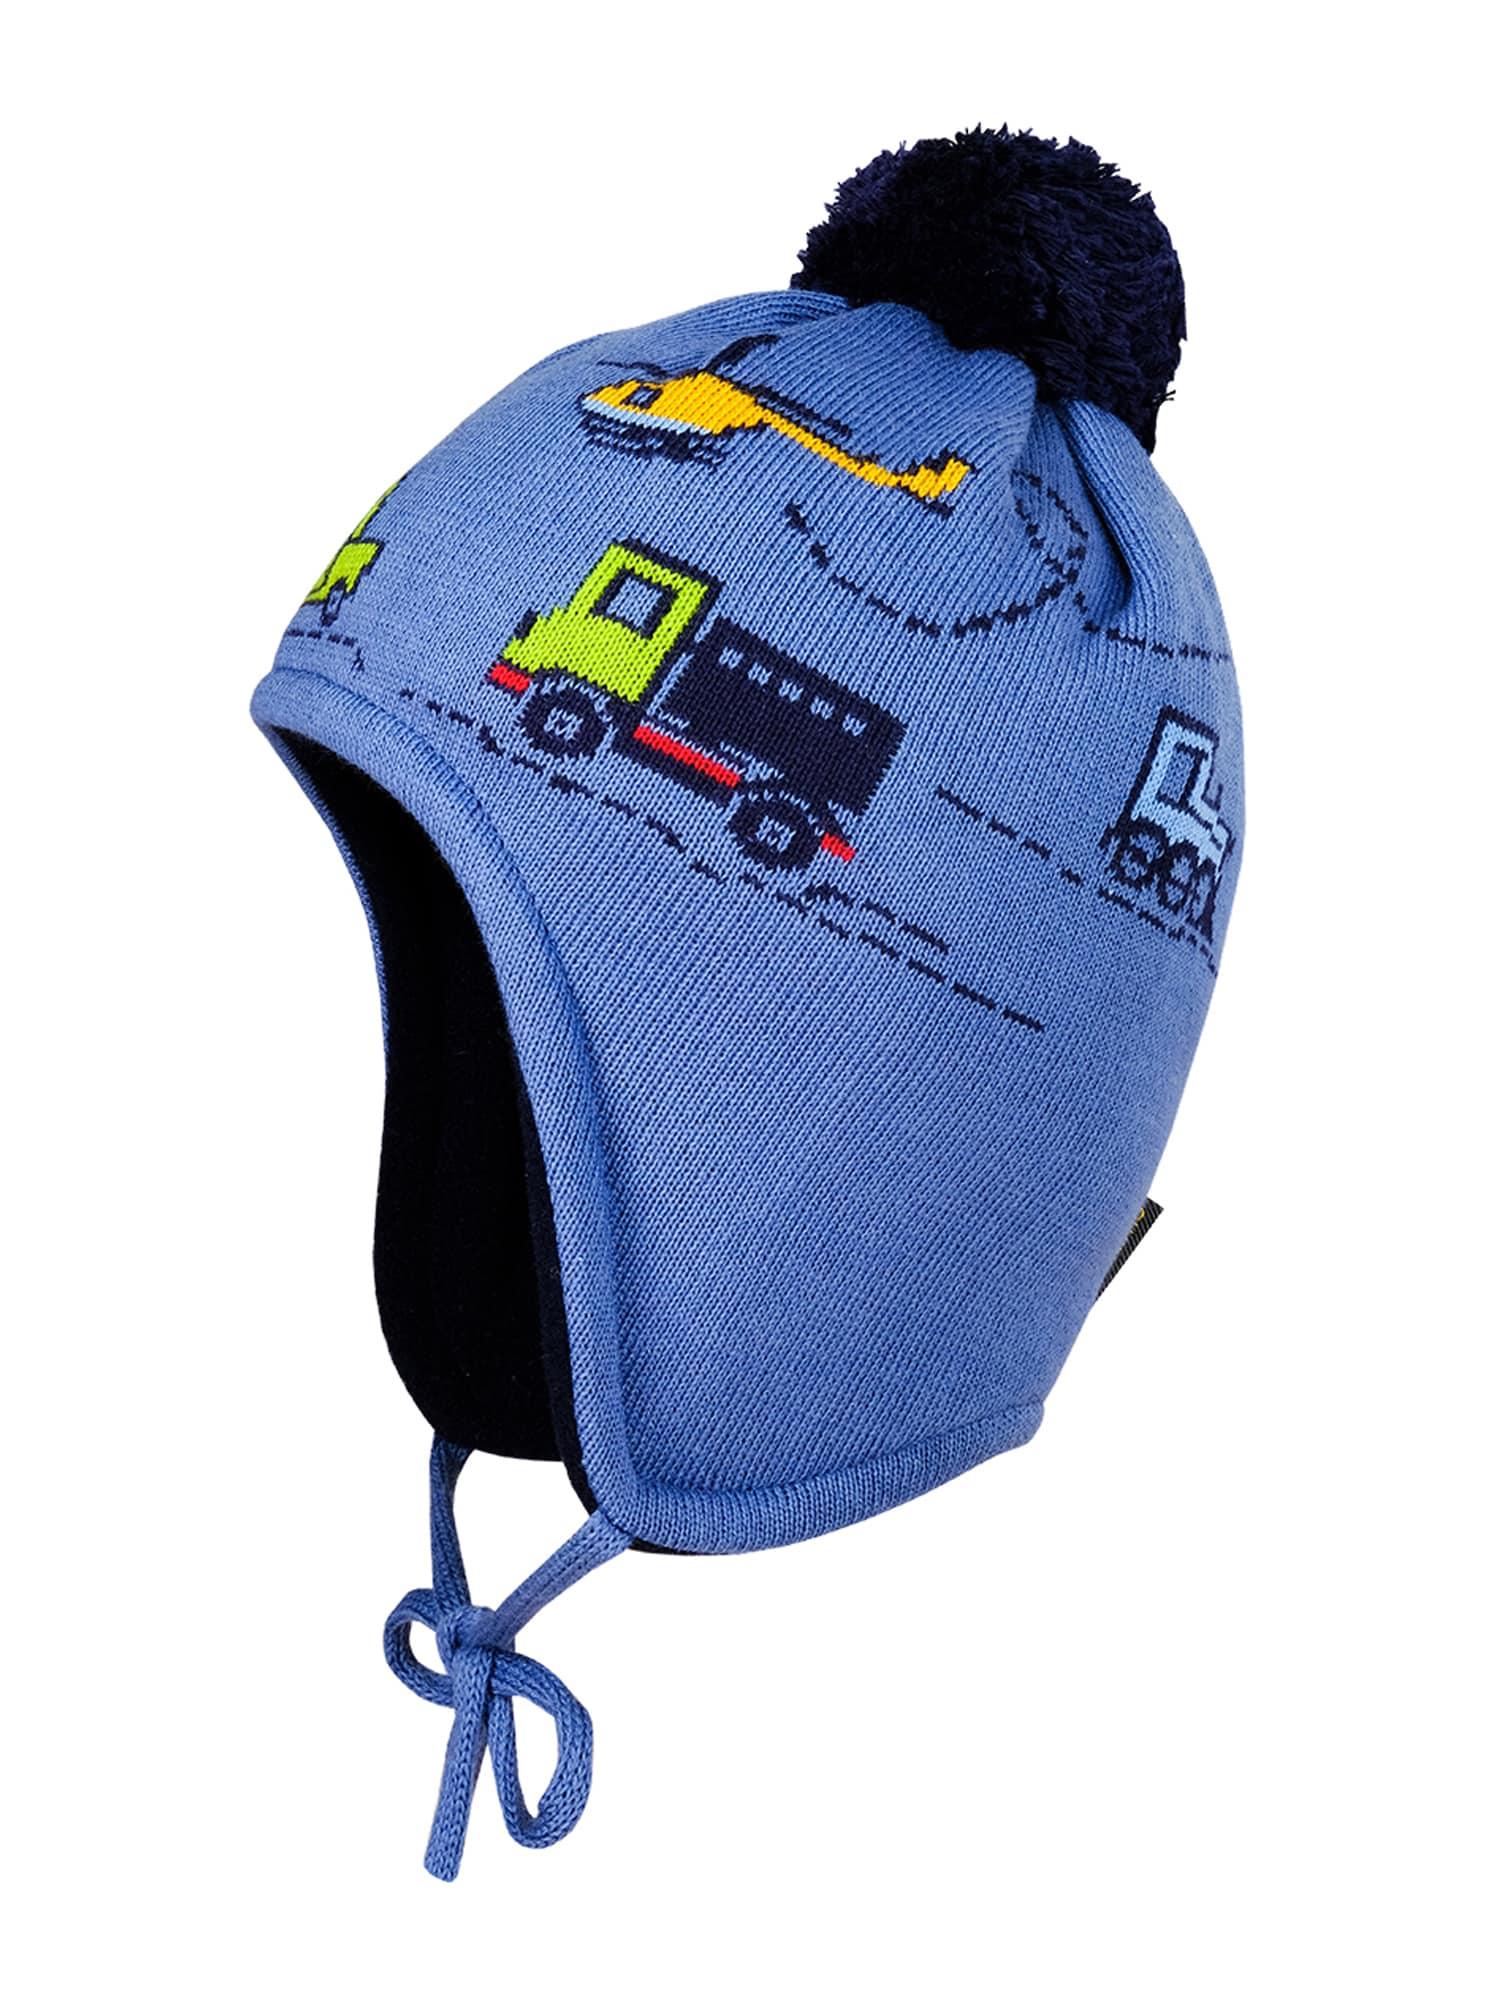 MAXIMO Megzta kepurė tamsiai mėlyna / mėlyna dūmų spalva / geltona / šviesiai žalia